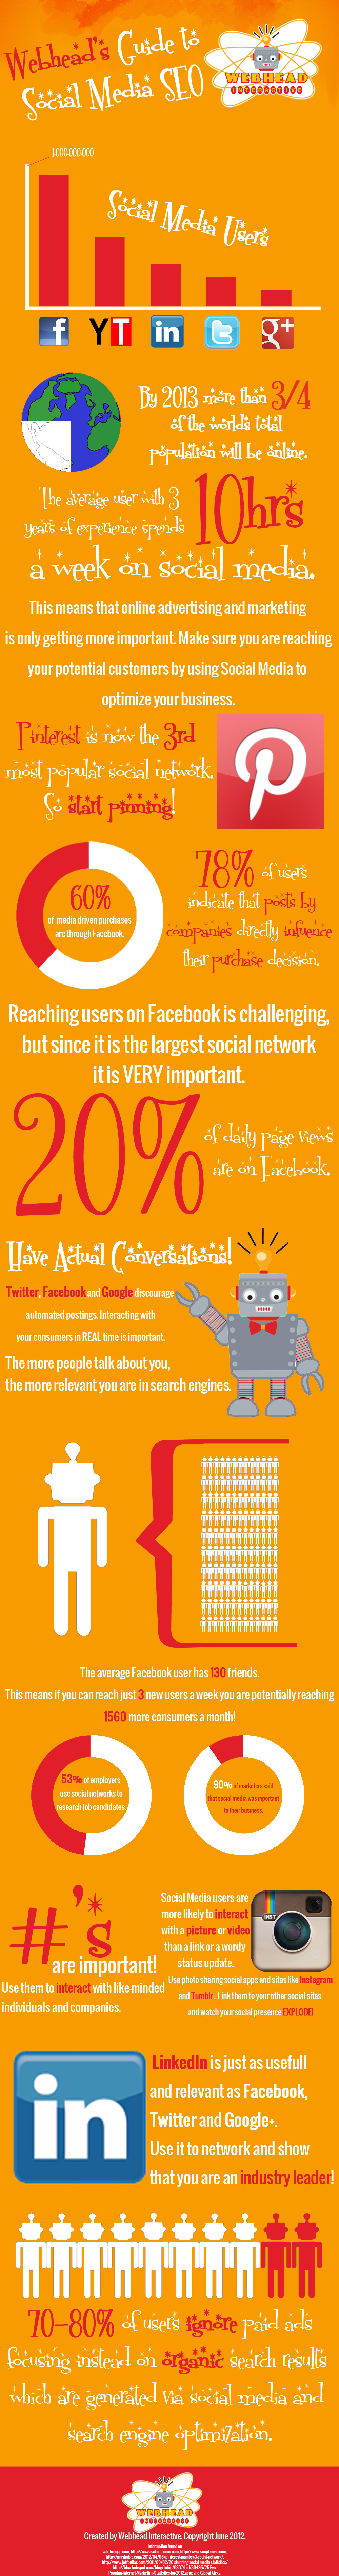 Infographic-social-media-statistieken-2012